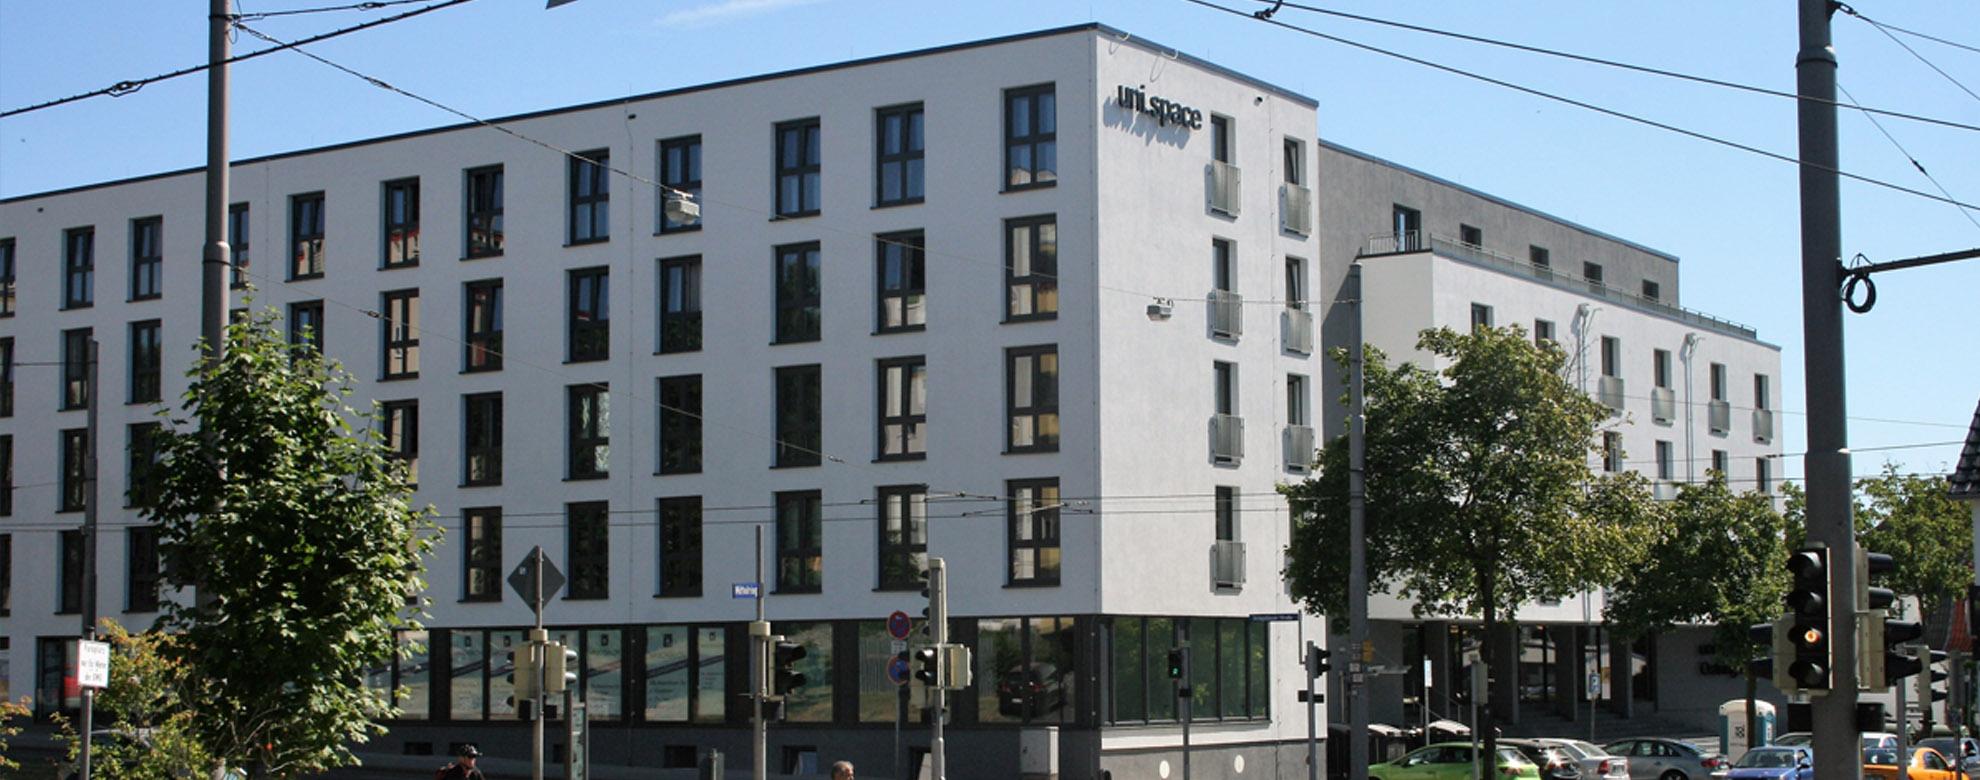 Ihringhäuser Straße | Kassel